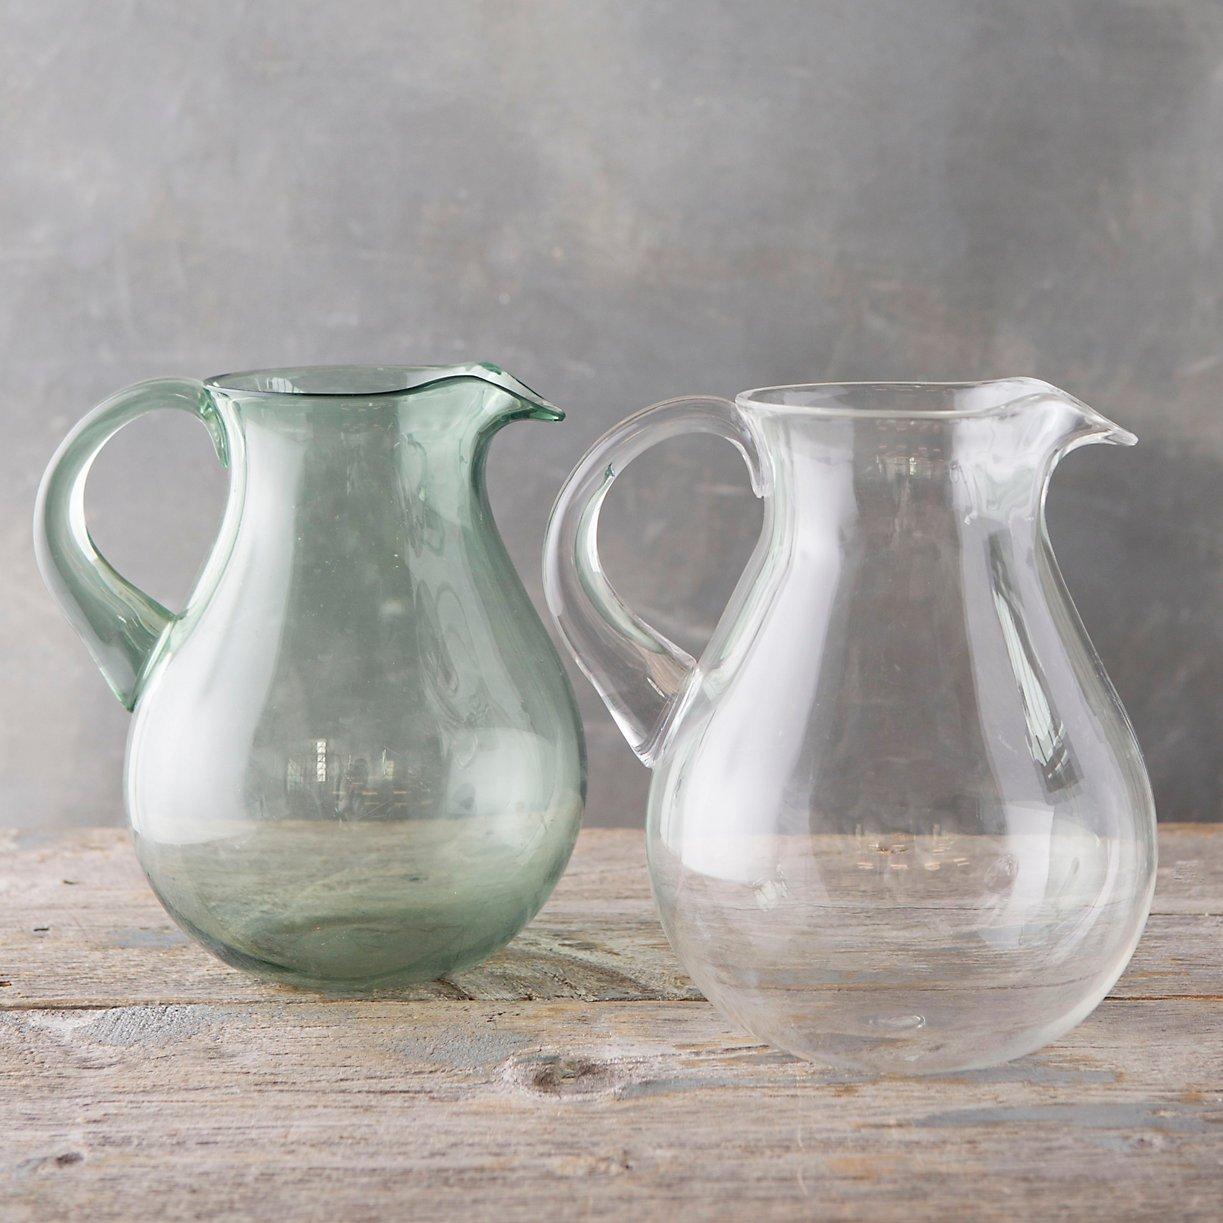 plastic pitchers for zero waste entertaining